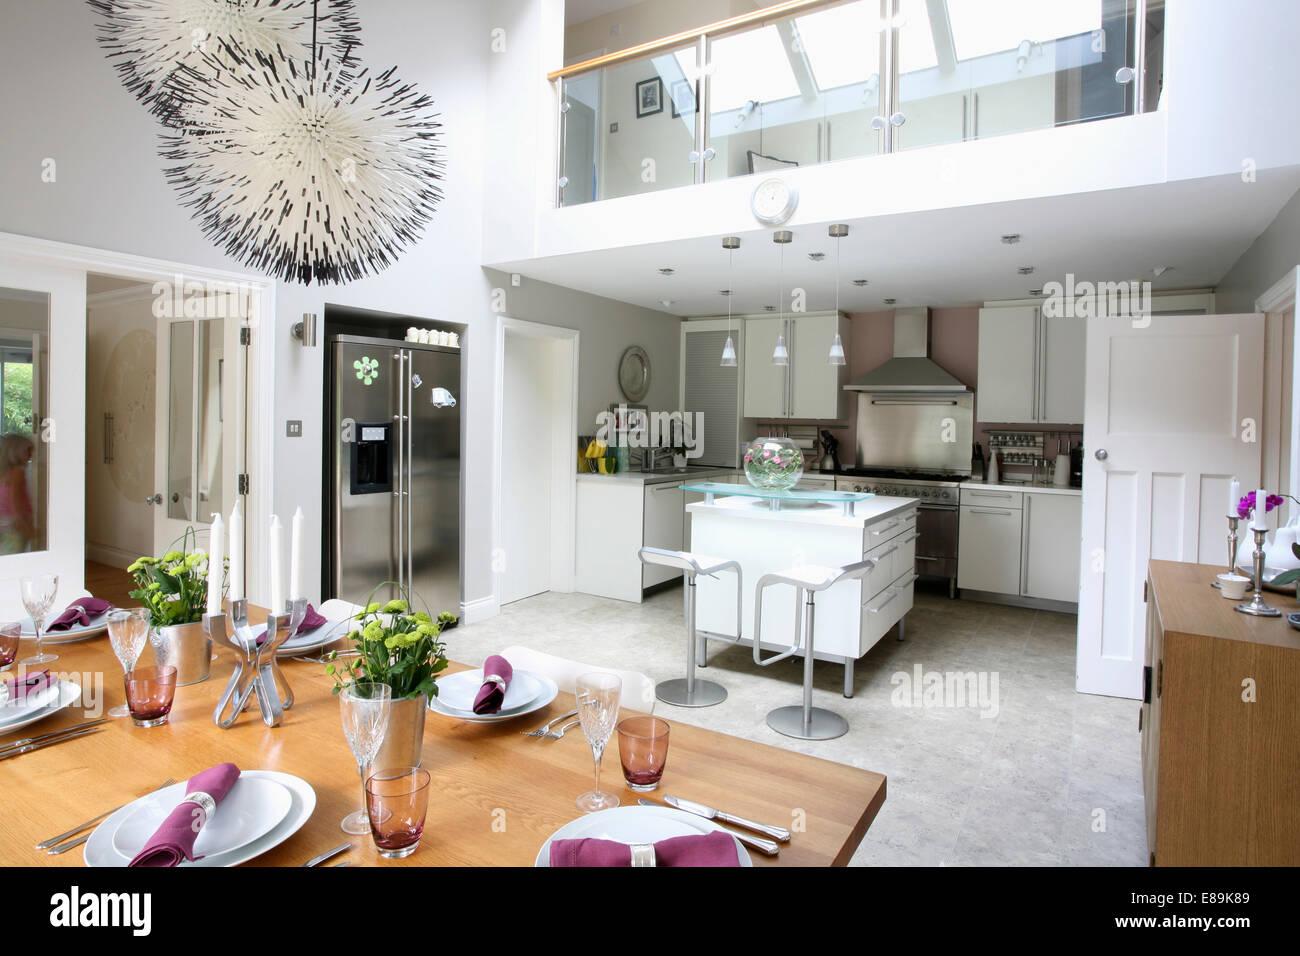 Sala e cucina moderna tavolo moderno bianco messico mobile per